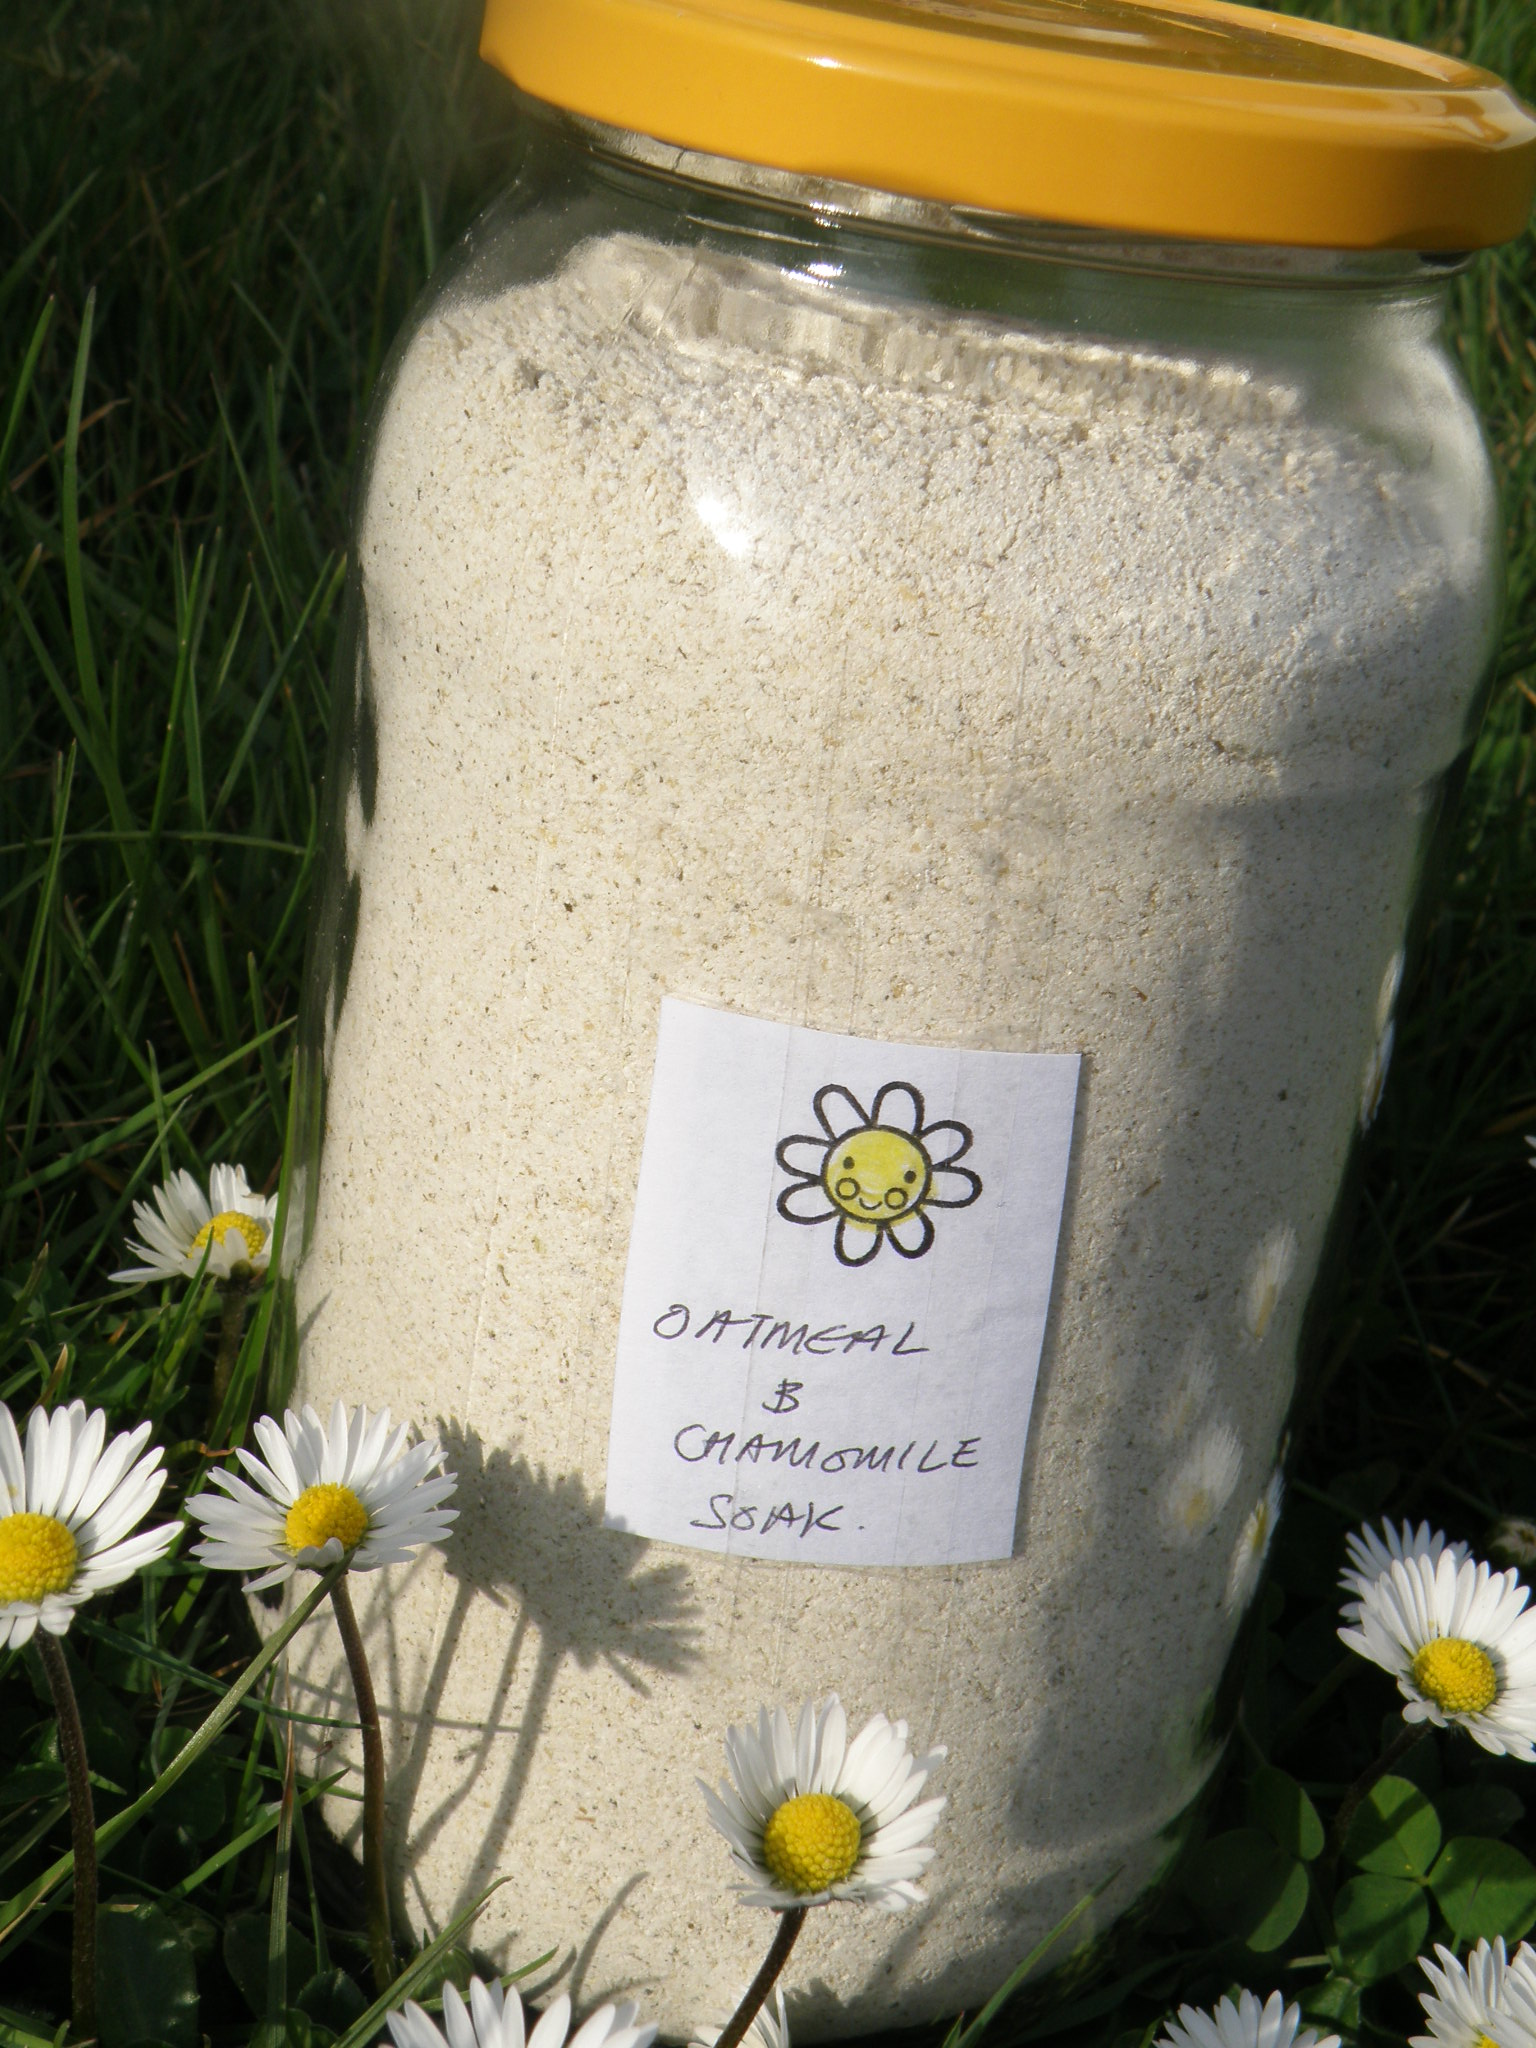 Colloidal Oatmeal Bath Soak With Chamomile I Bake Without